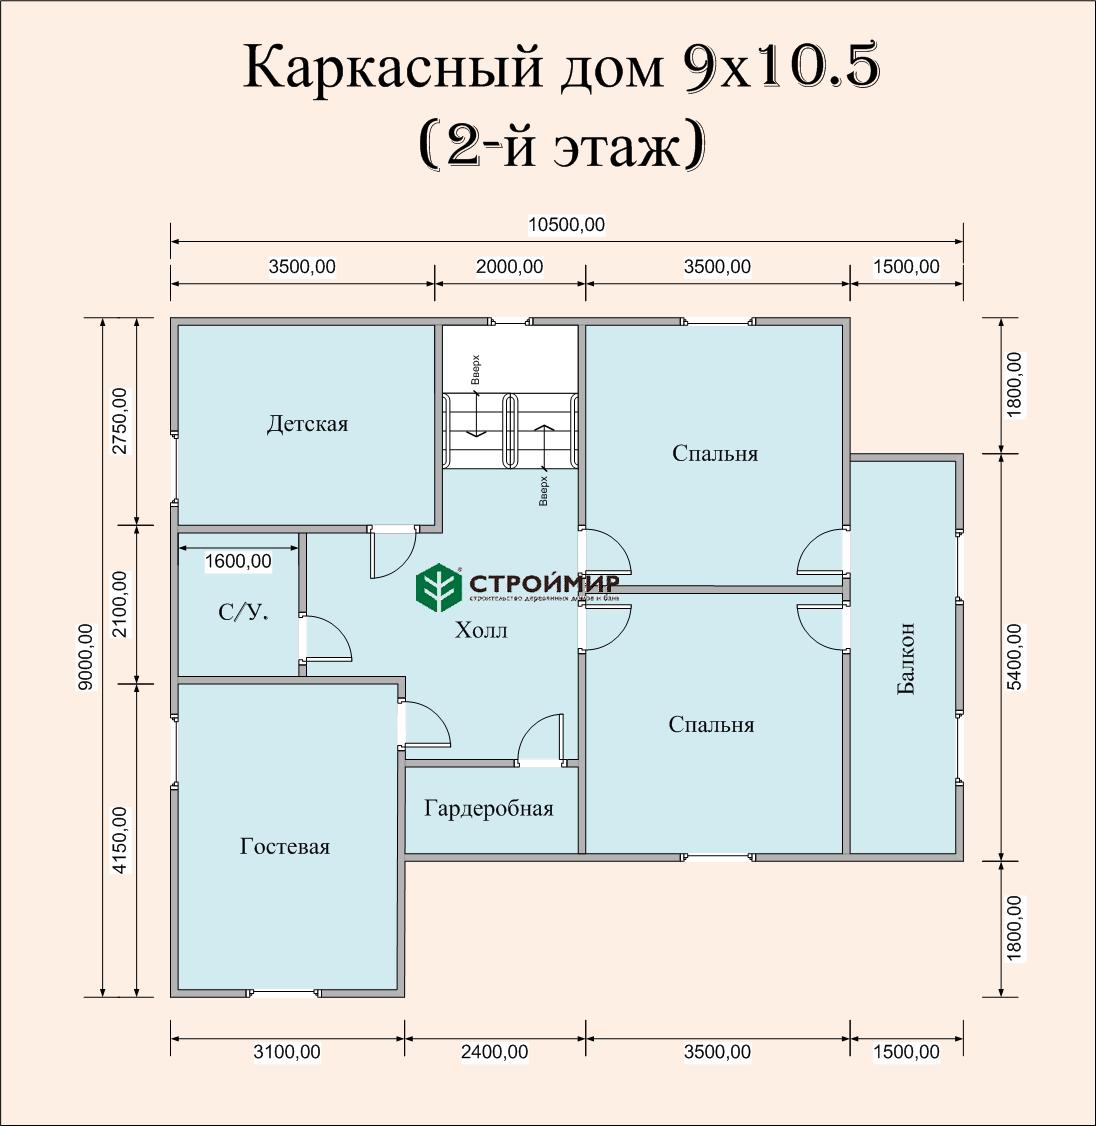 Каркасный дом 9х10,5, проект К-43